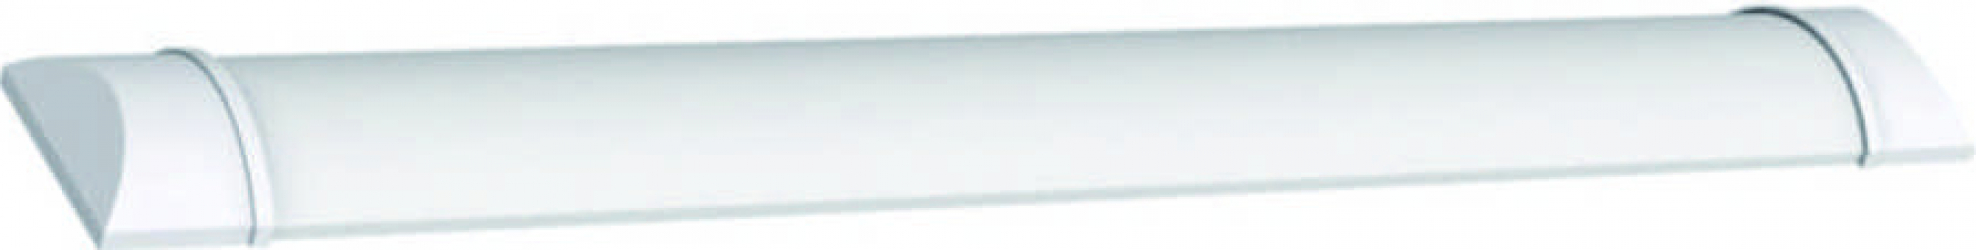 Corp liniar LED 30W 900mm 4000K Well Corpuri de iluminat